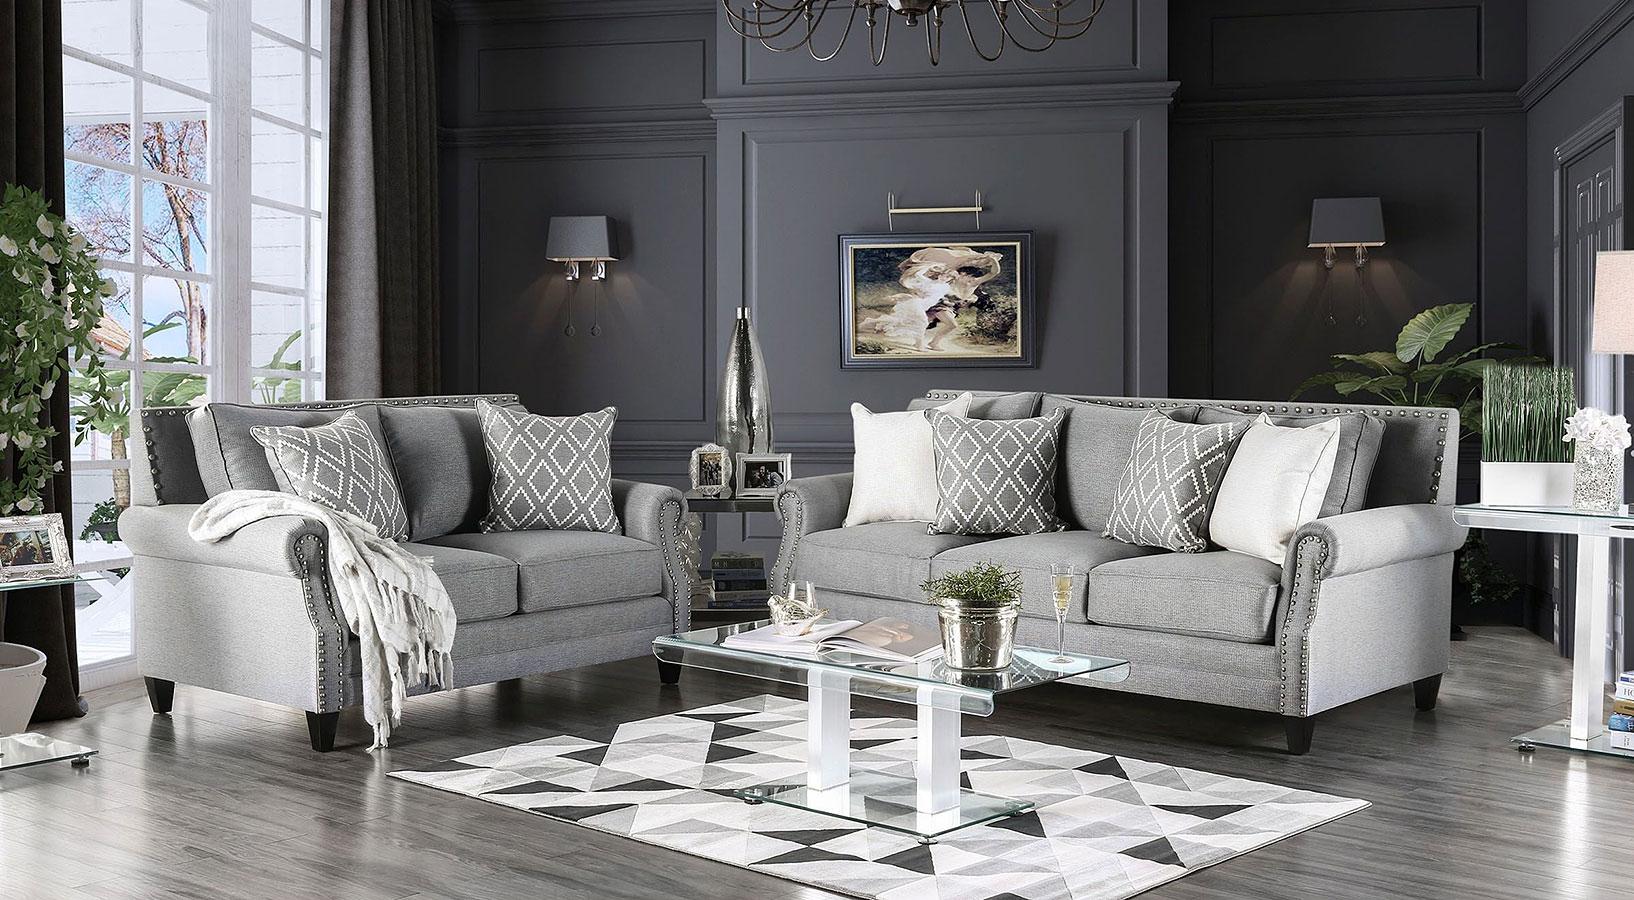 Giovanni Living Room Set (Grey) Furniture Of America, 1